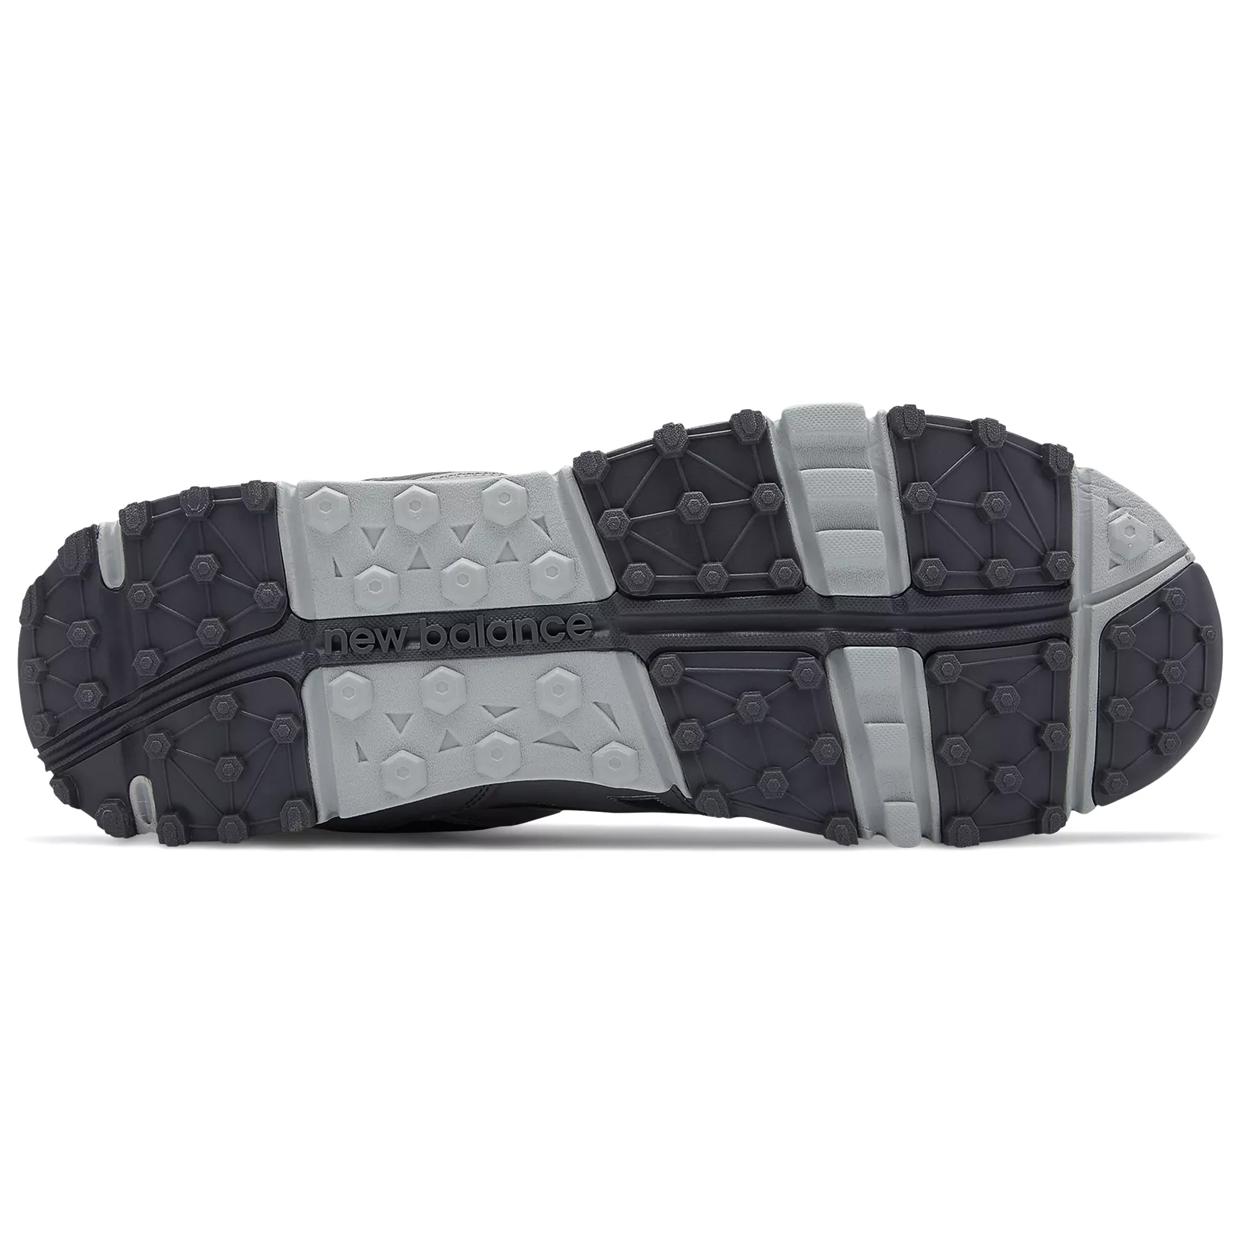 New-Balance-NBG574SL-Men-039-s-Spikeless-Microfiber-Leather-Golf-Shoe-New thumbnail 6